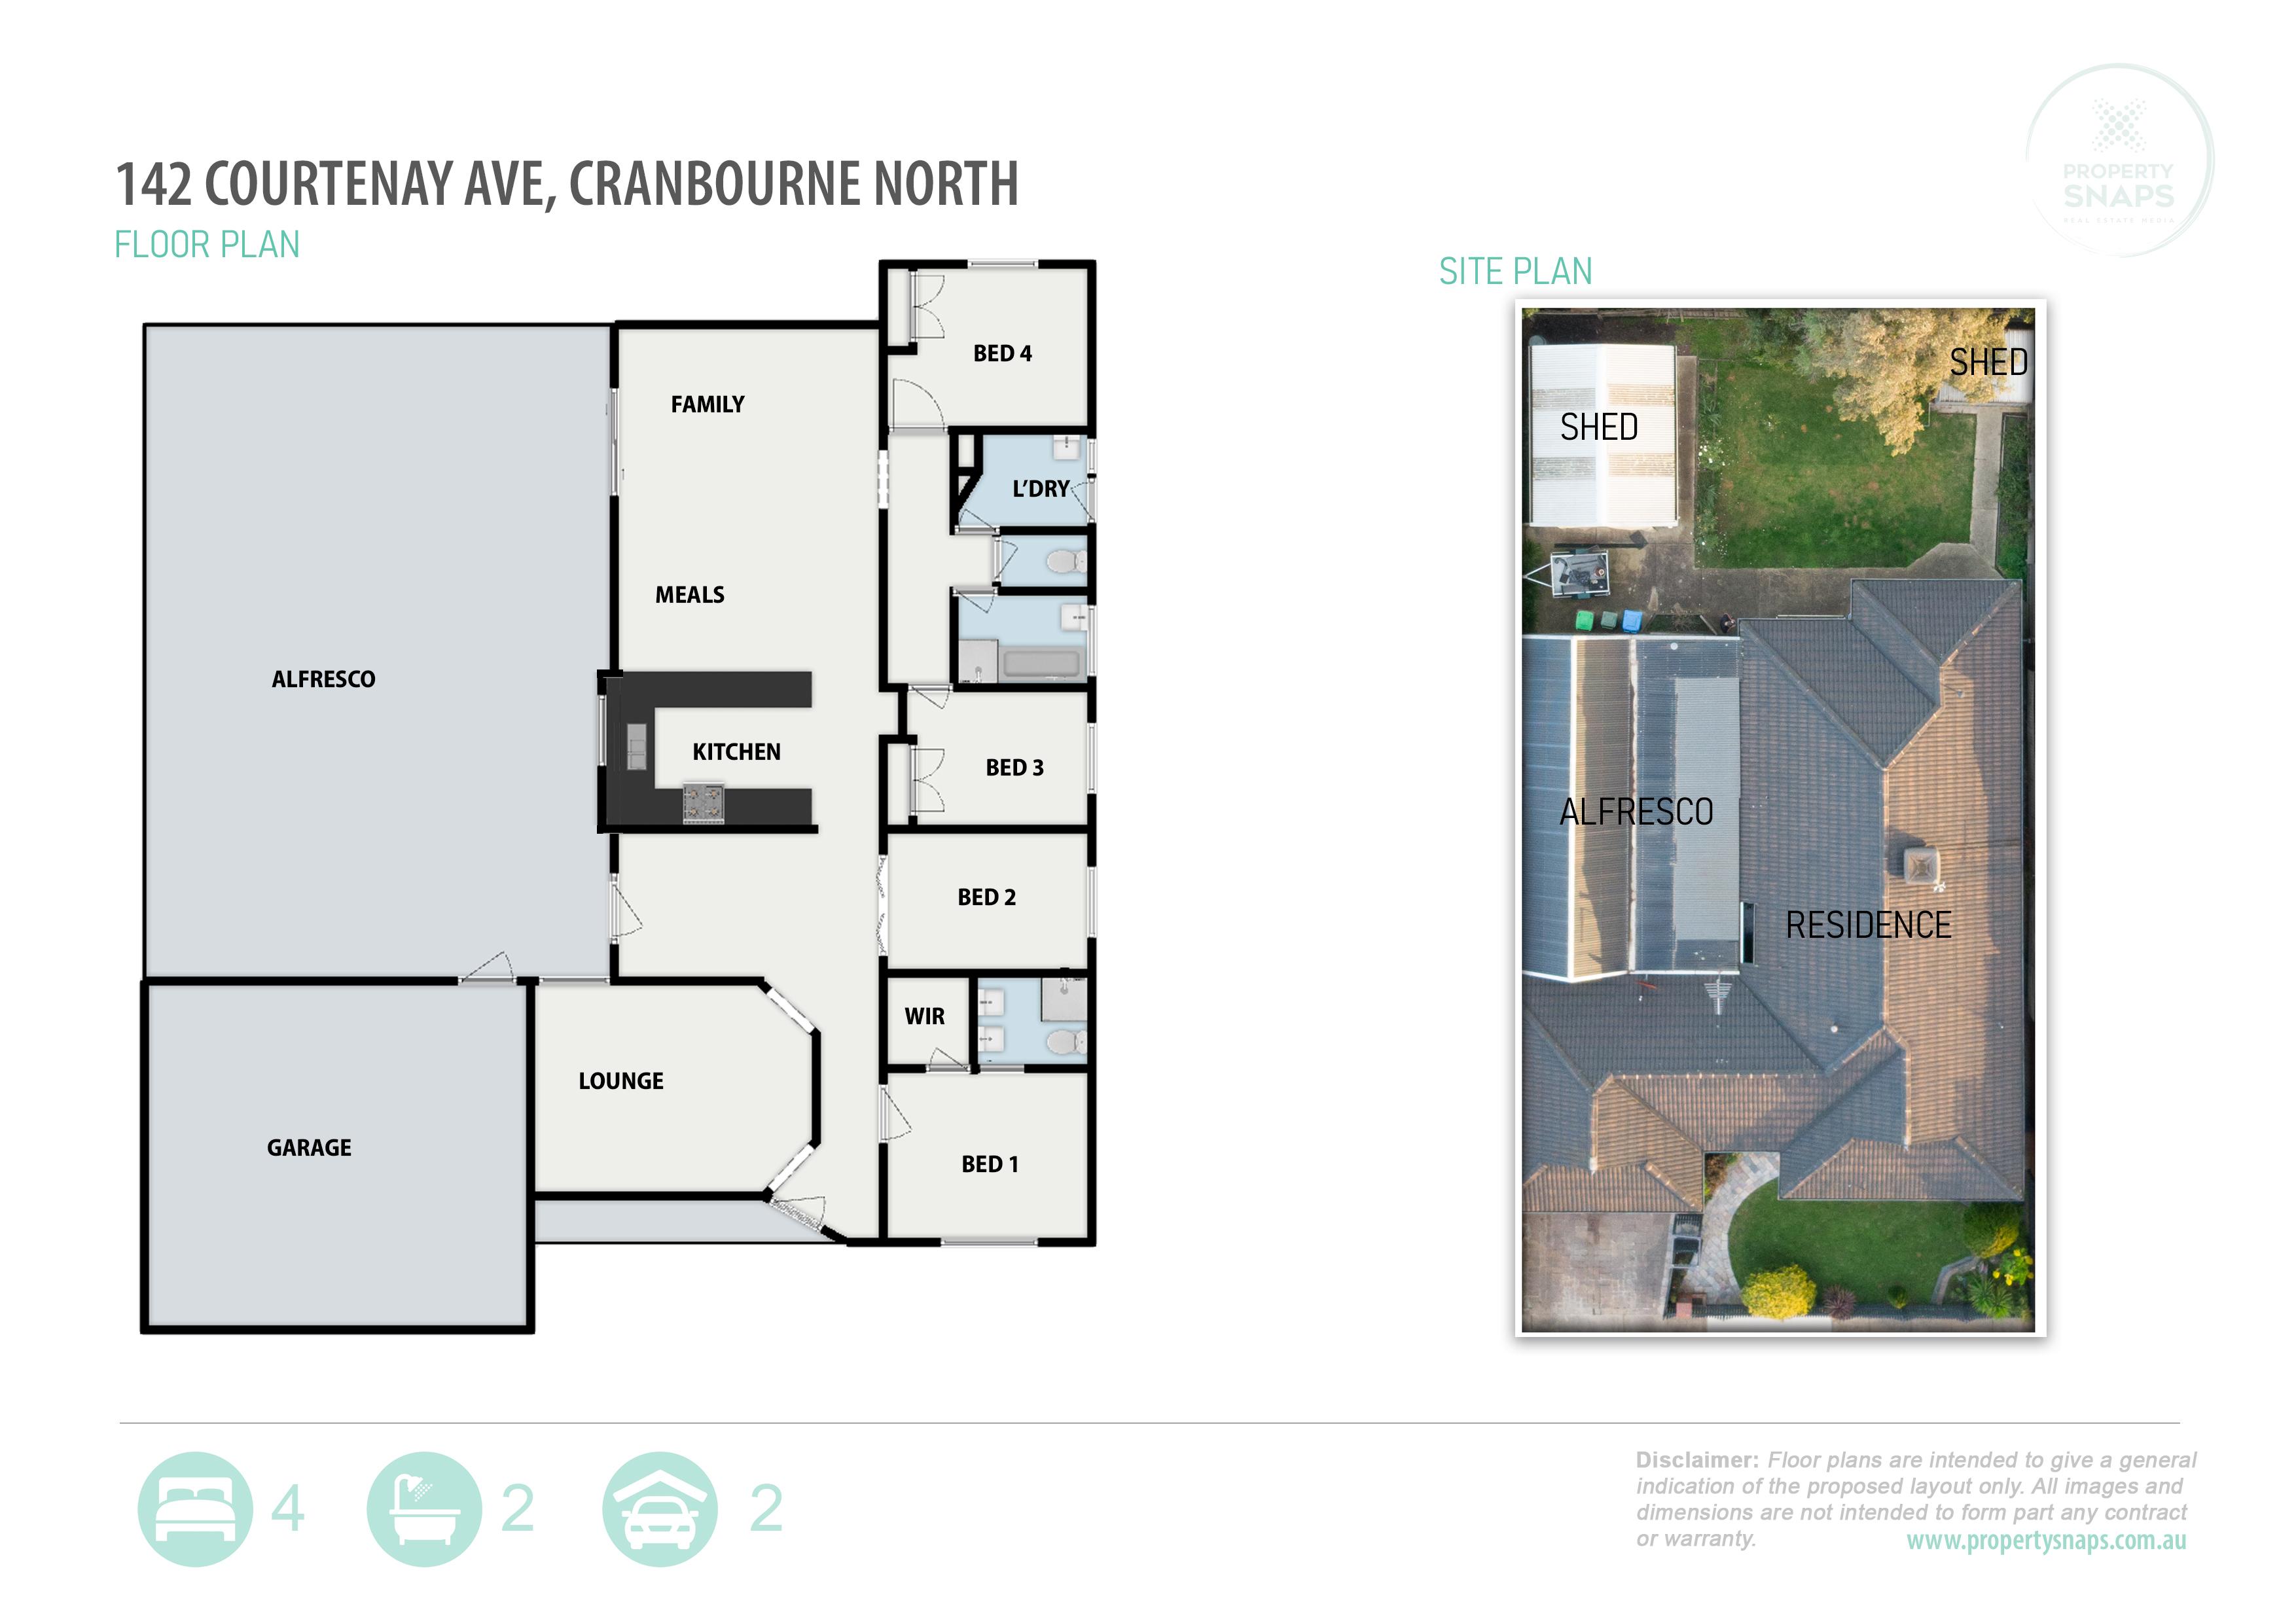 142 COURTENAY AVENUE, Cranbourne North